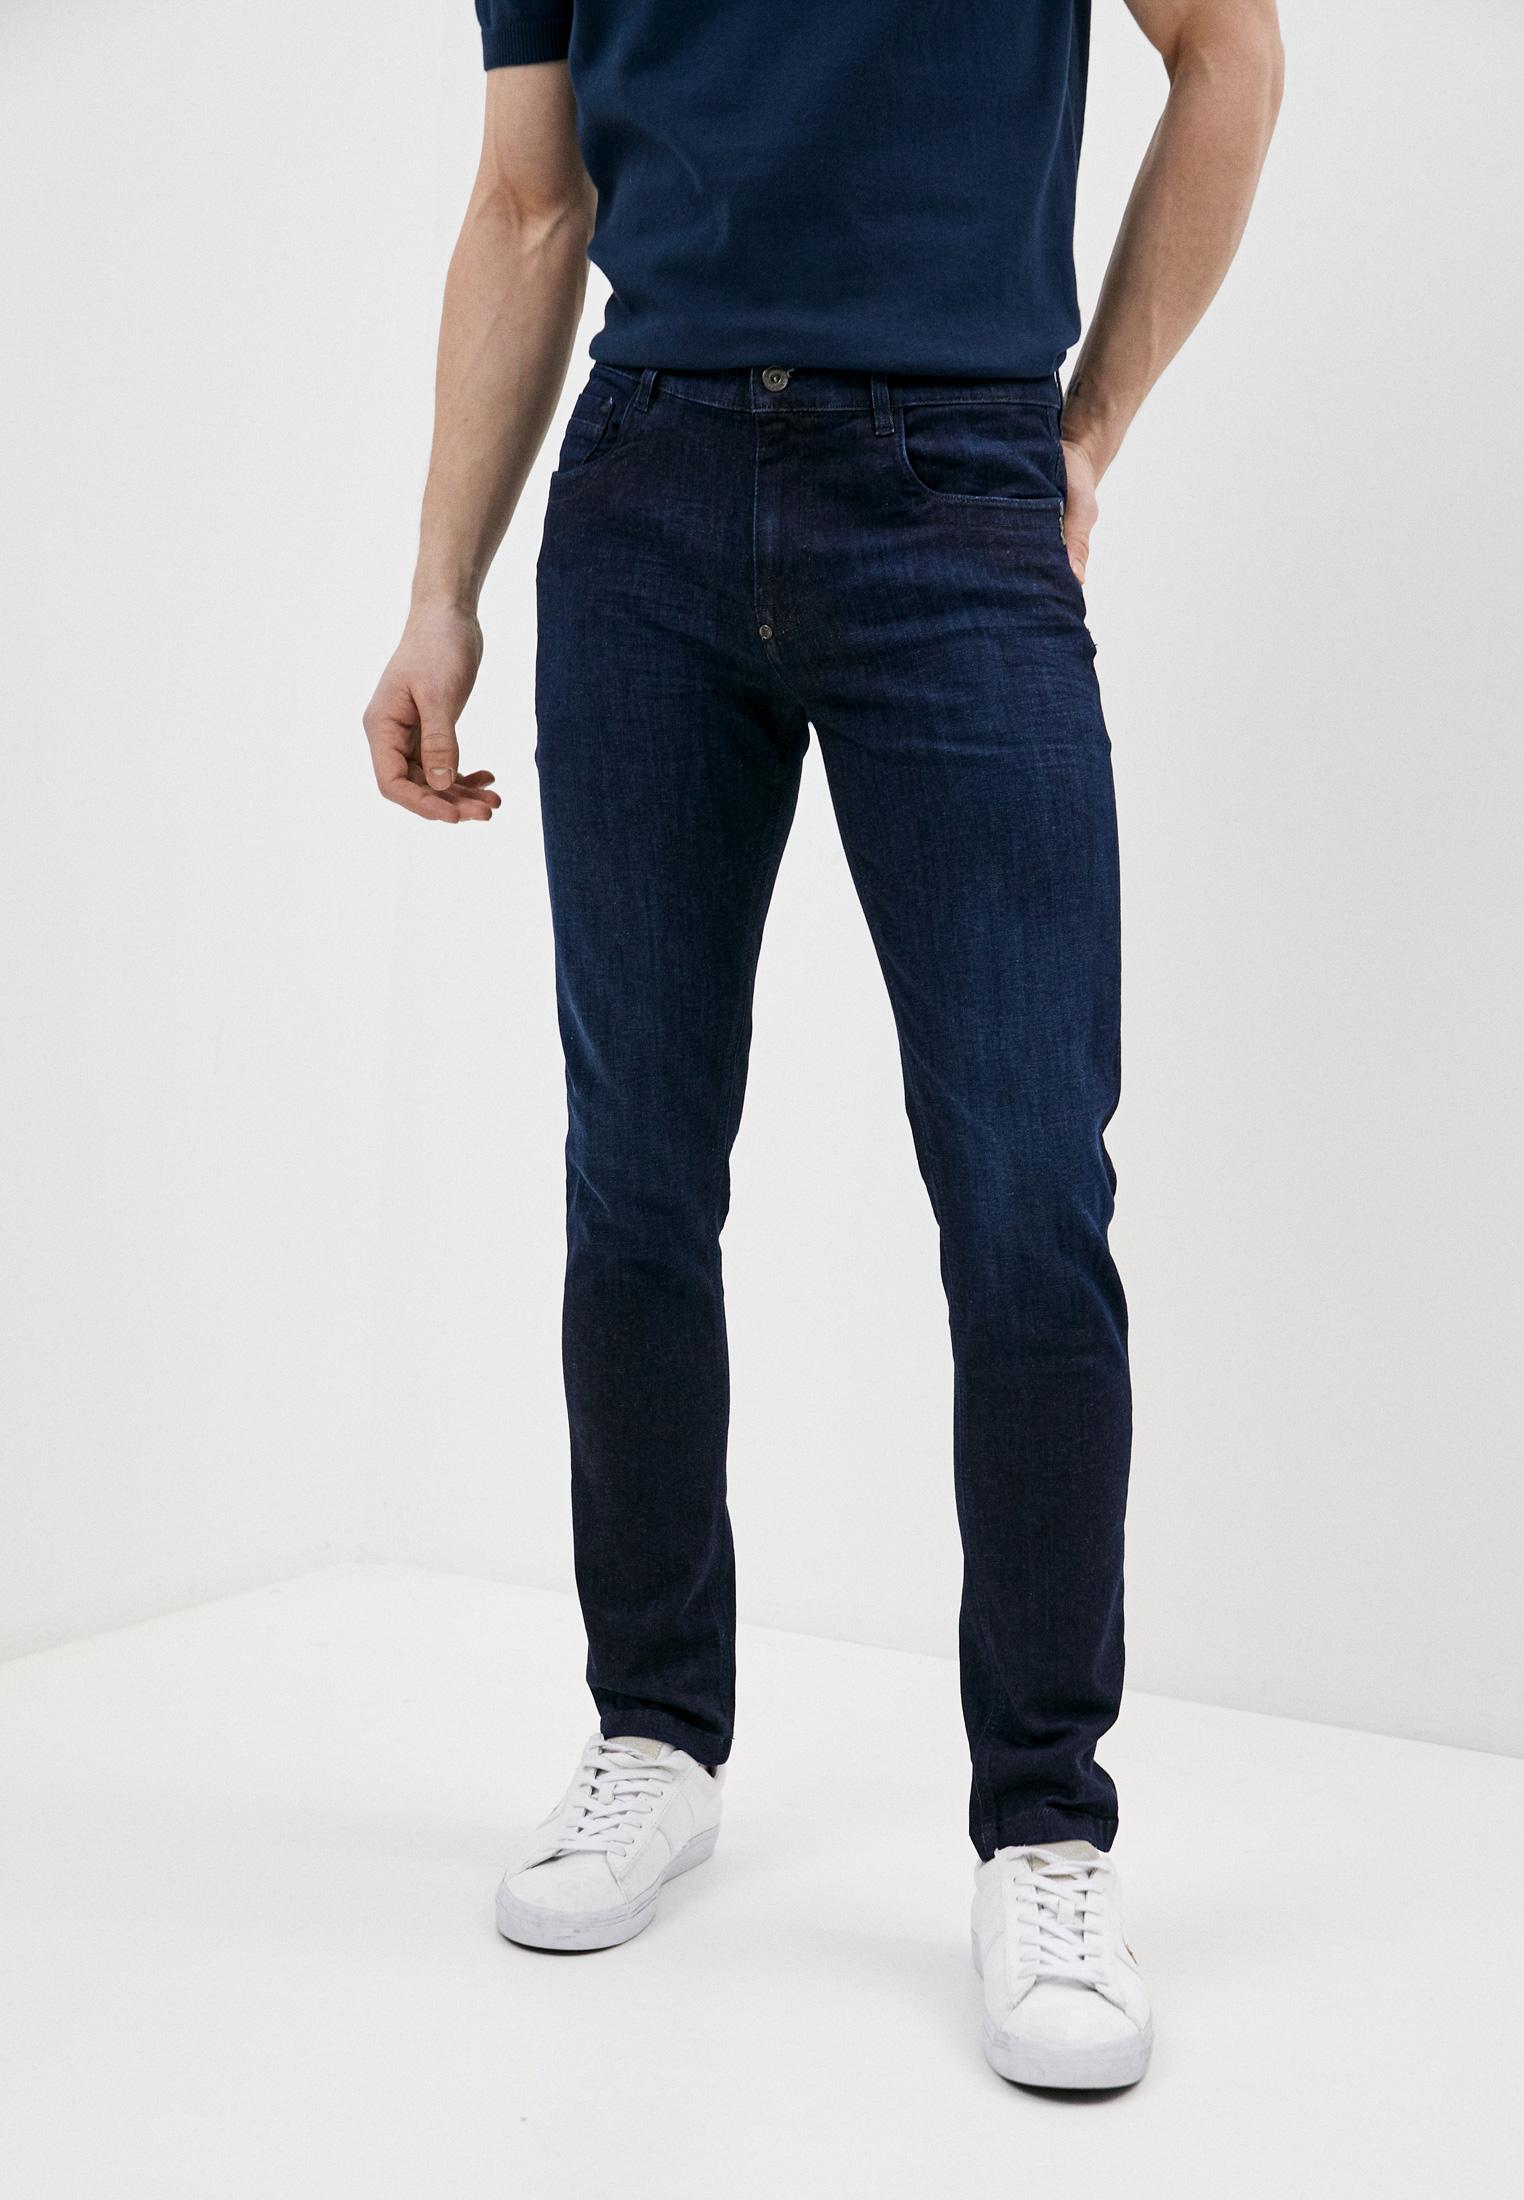 Мужские зауженные джинсы Bikkembergs (Биккембергс) C Q 109 03 S 3511